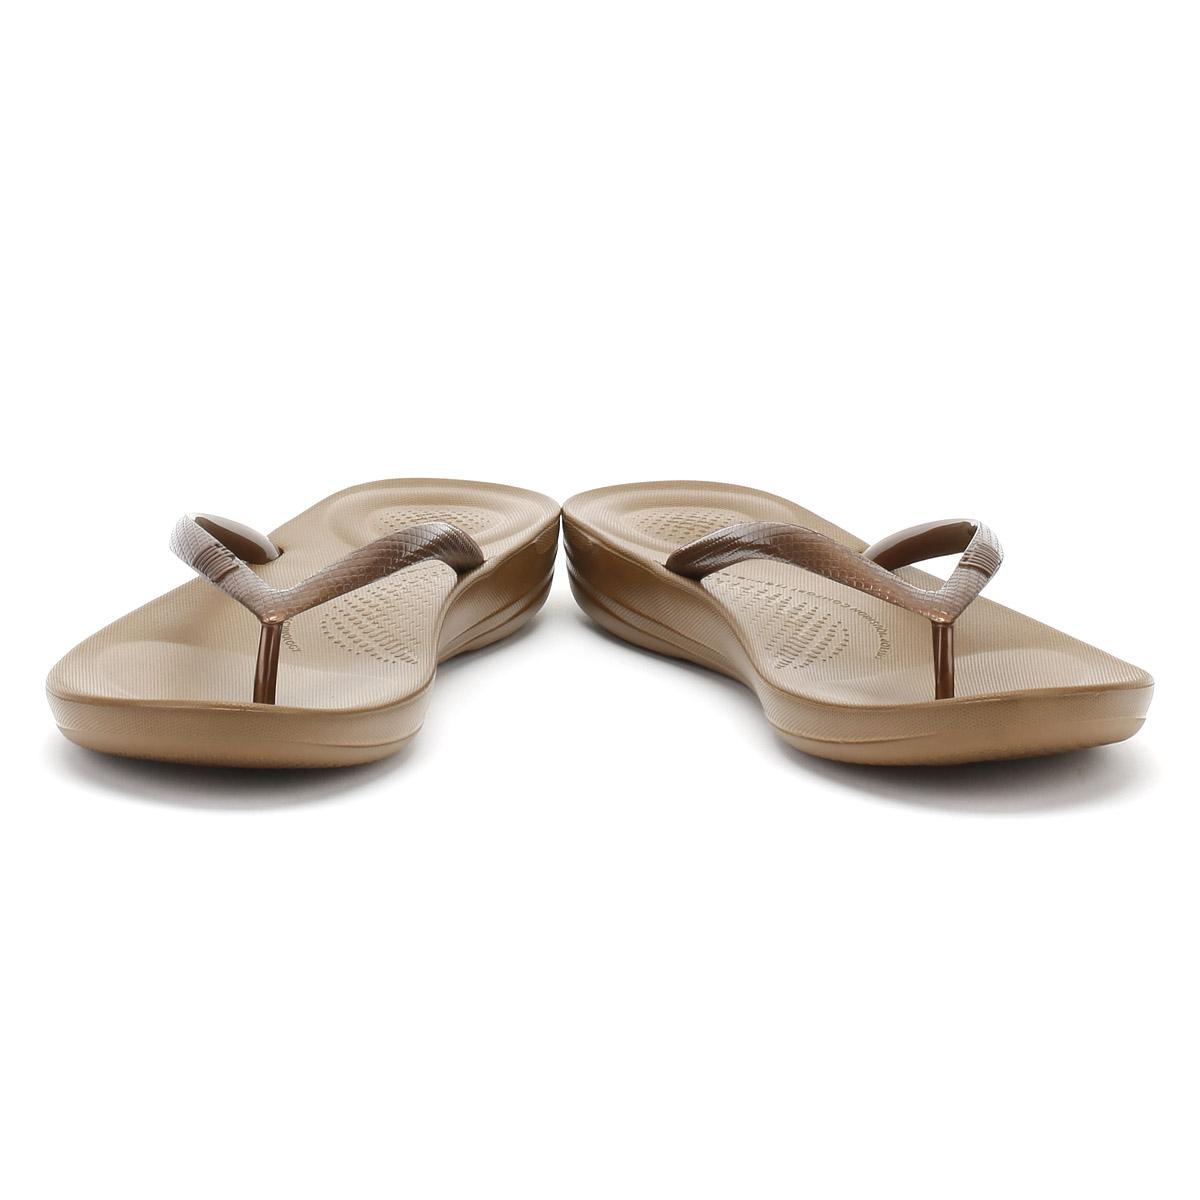 3837b89525327 FitFlop Women s Iqushion Ergonomic Rubber Toe Post Flip Flop Bronze ...